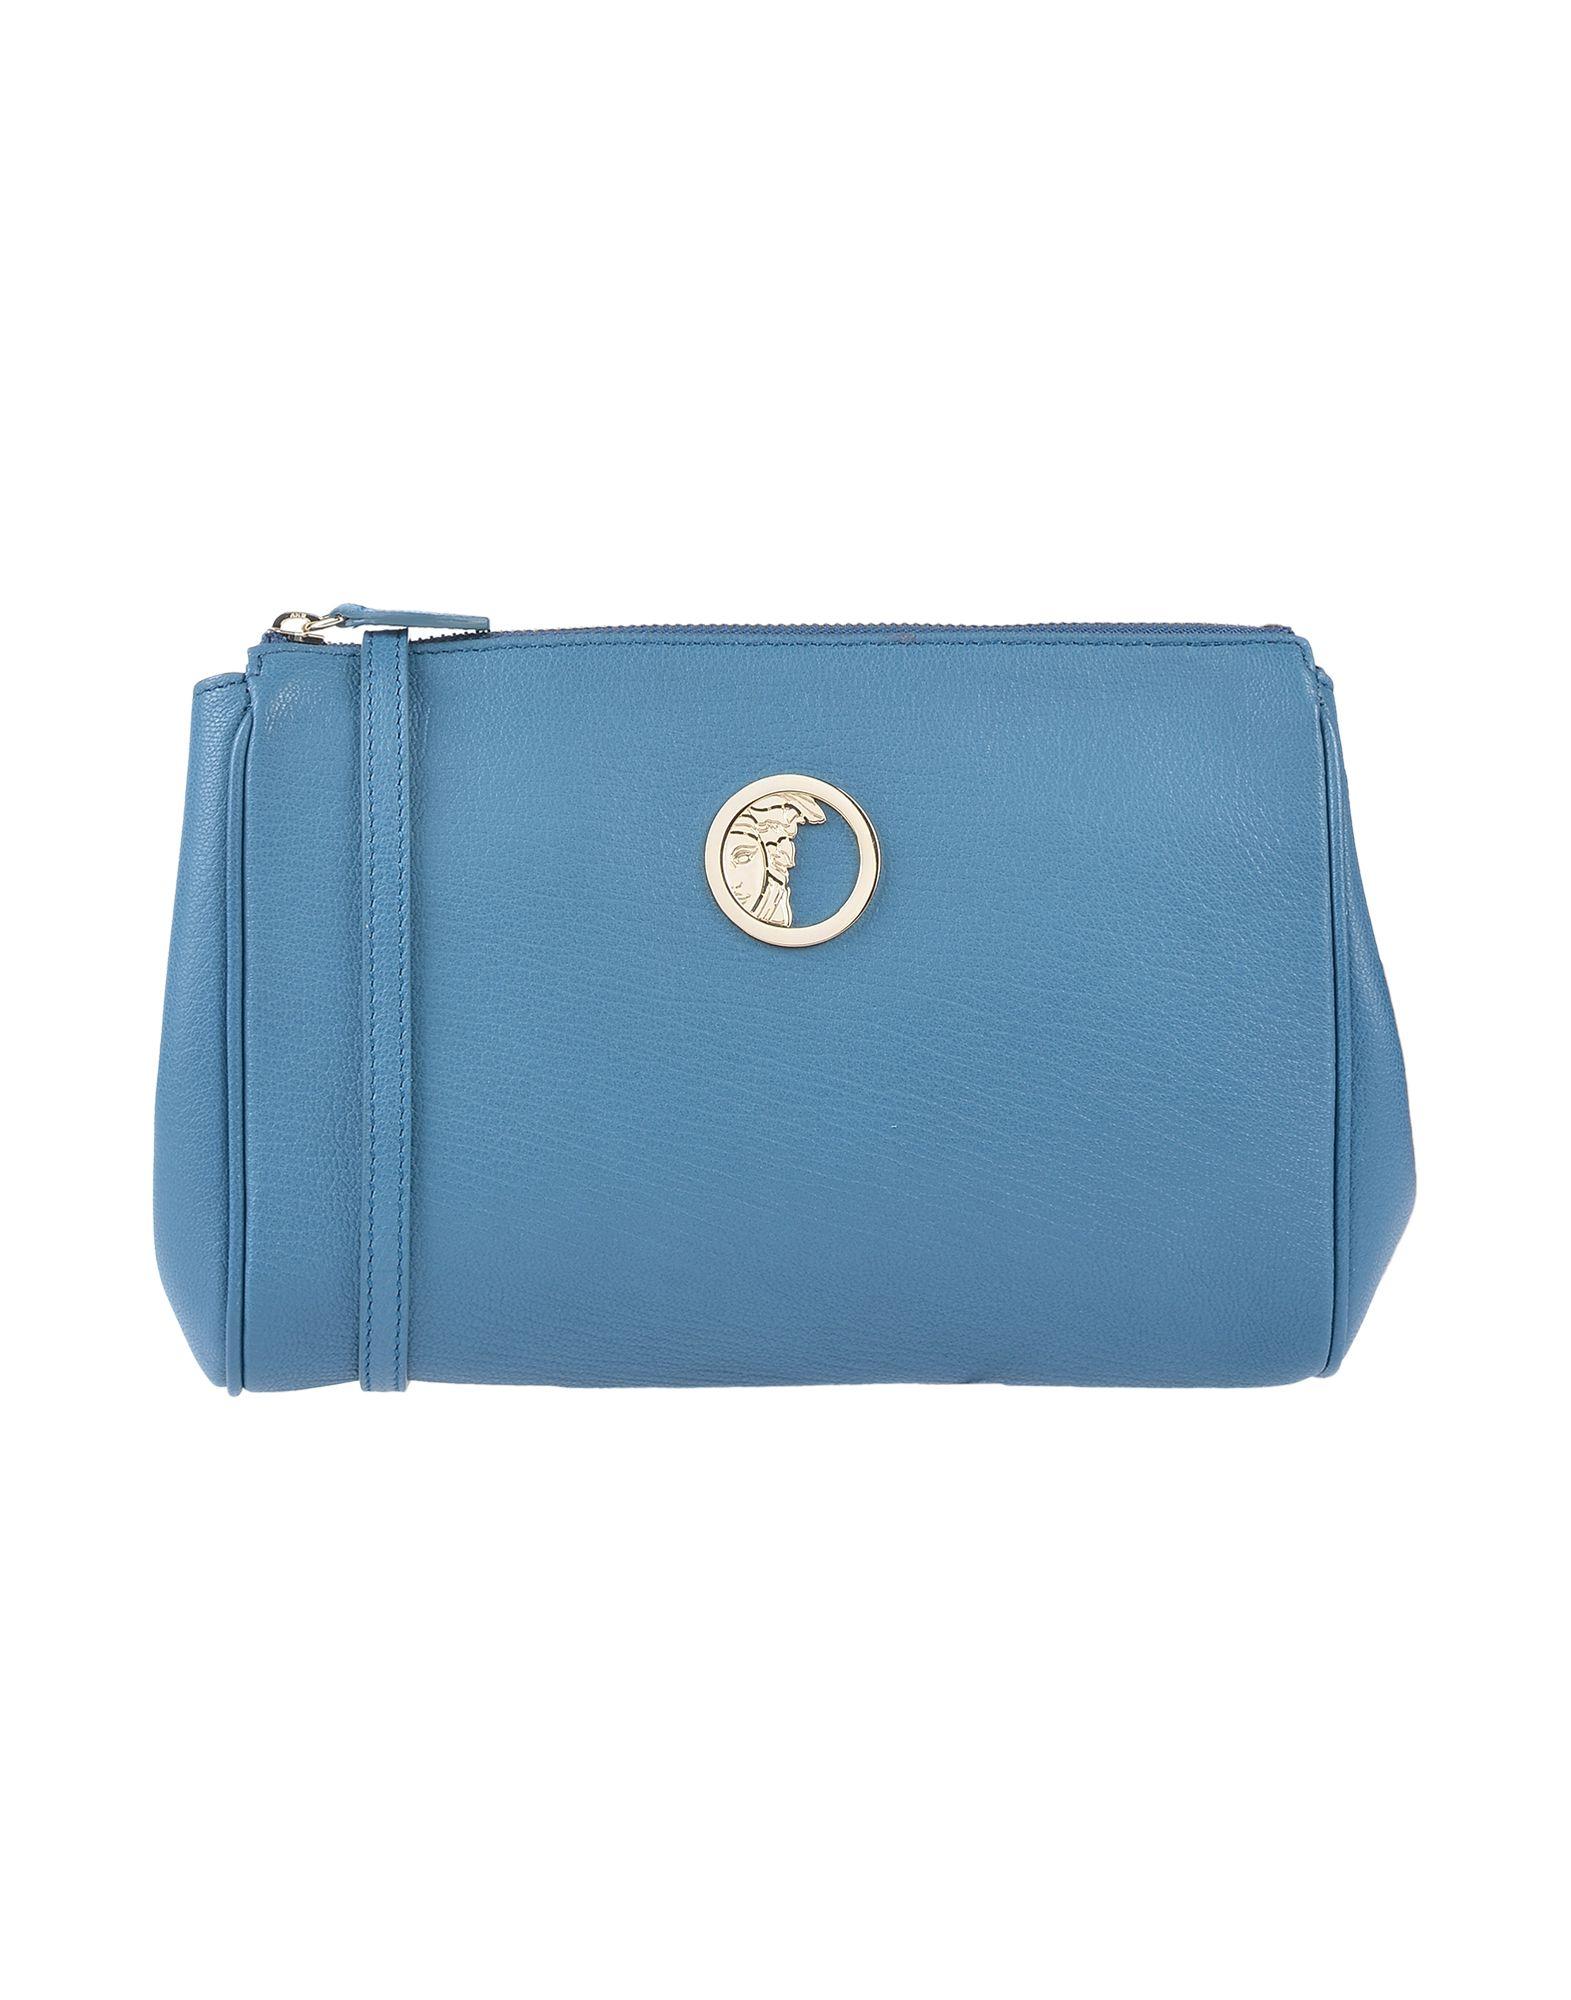 VERSACE COLLECTION Сумка на руку versace collection сумка на руку